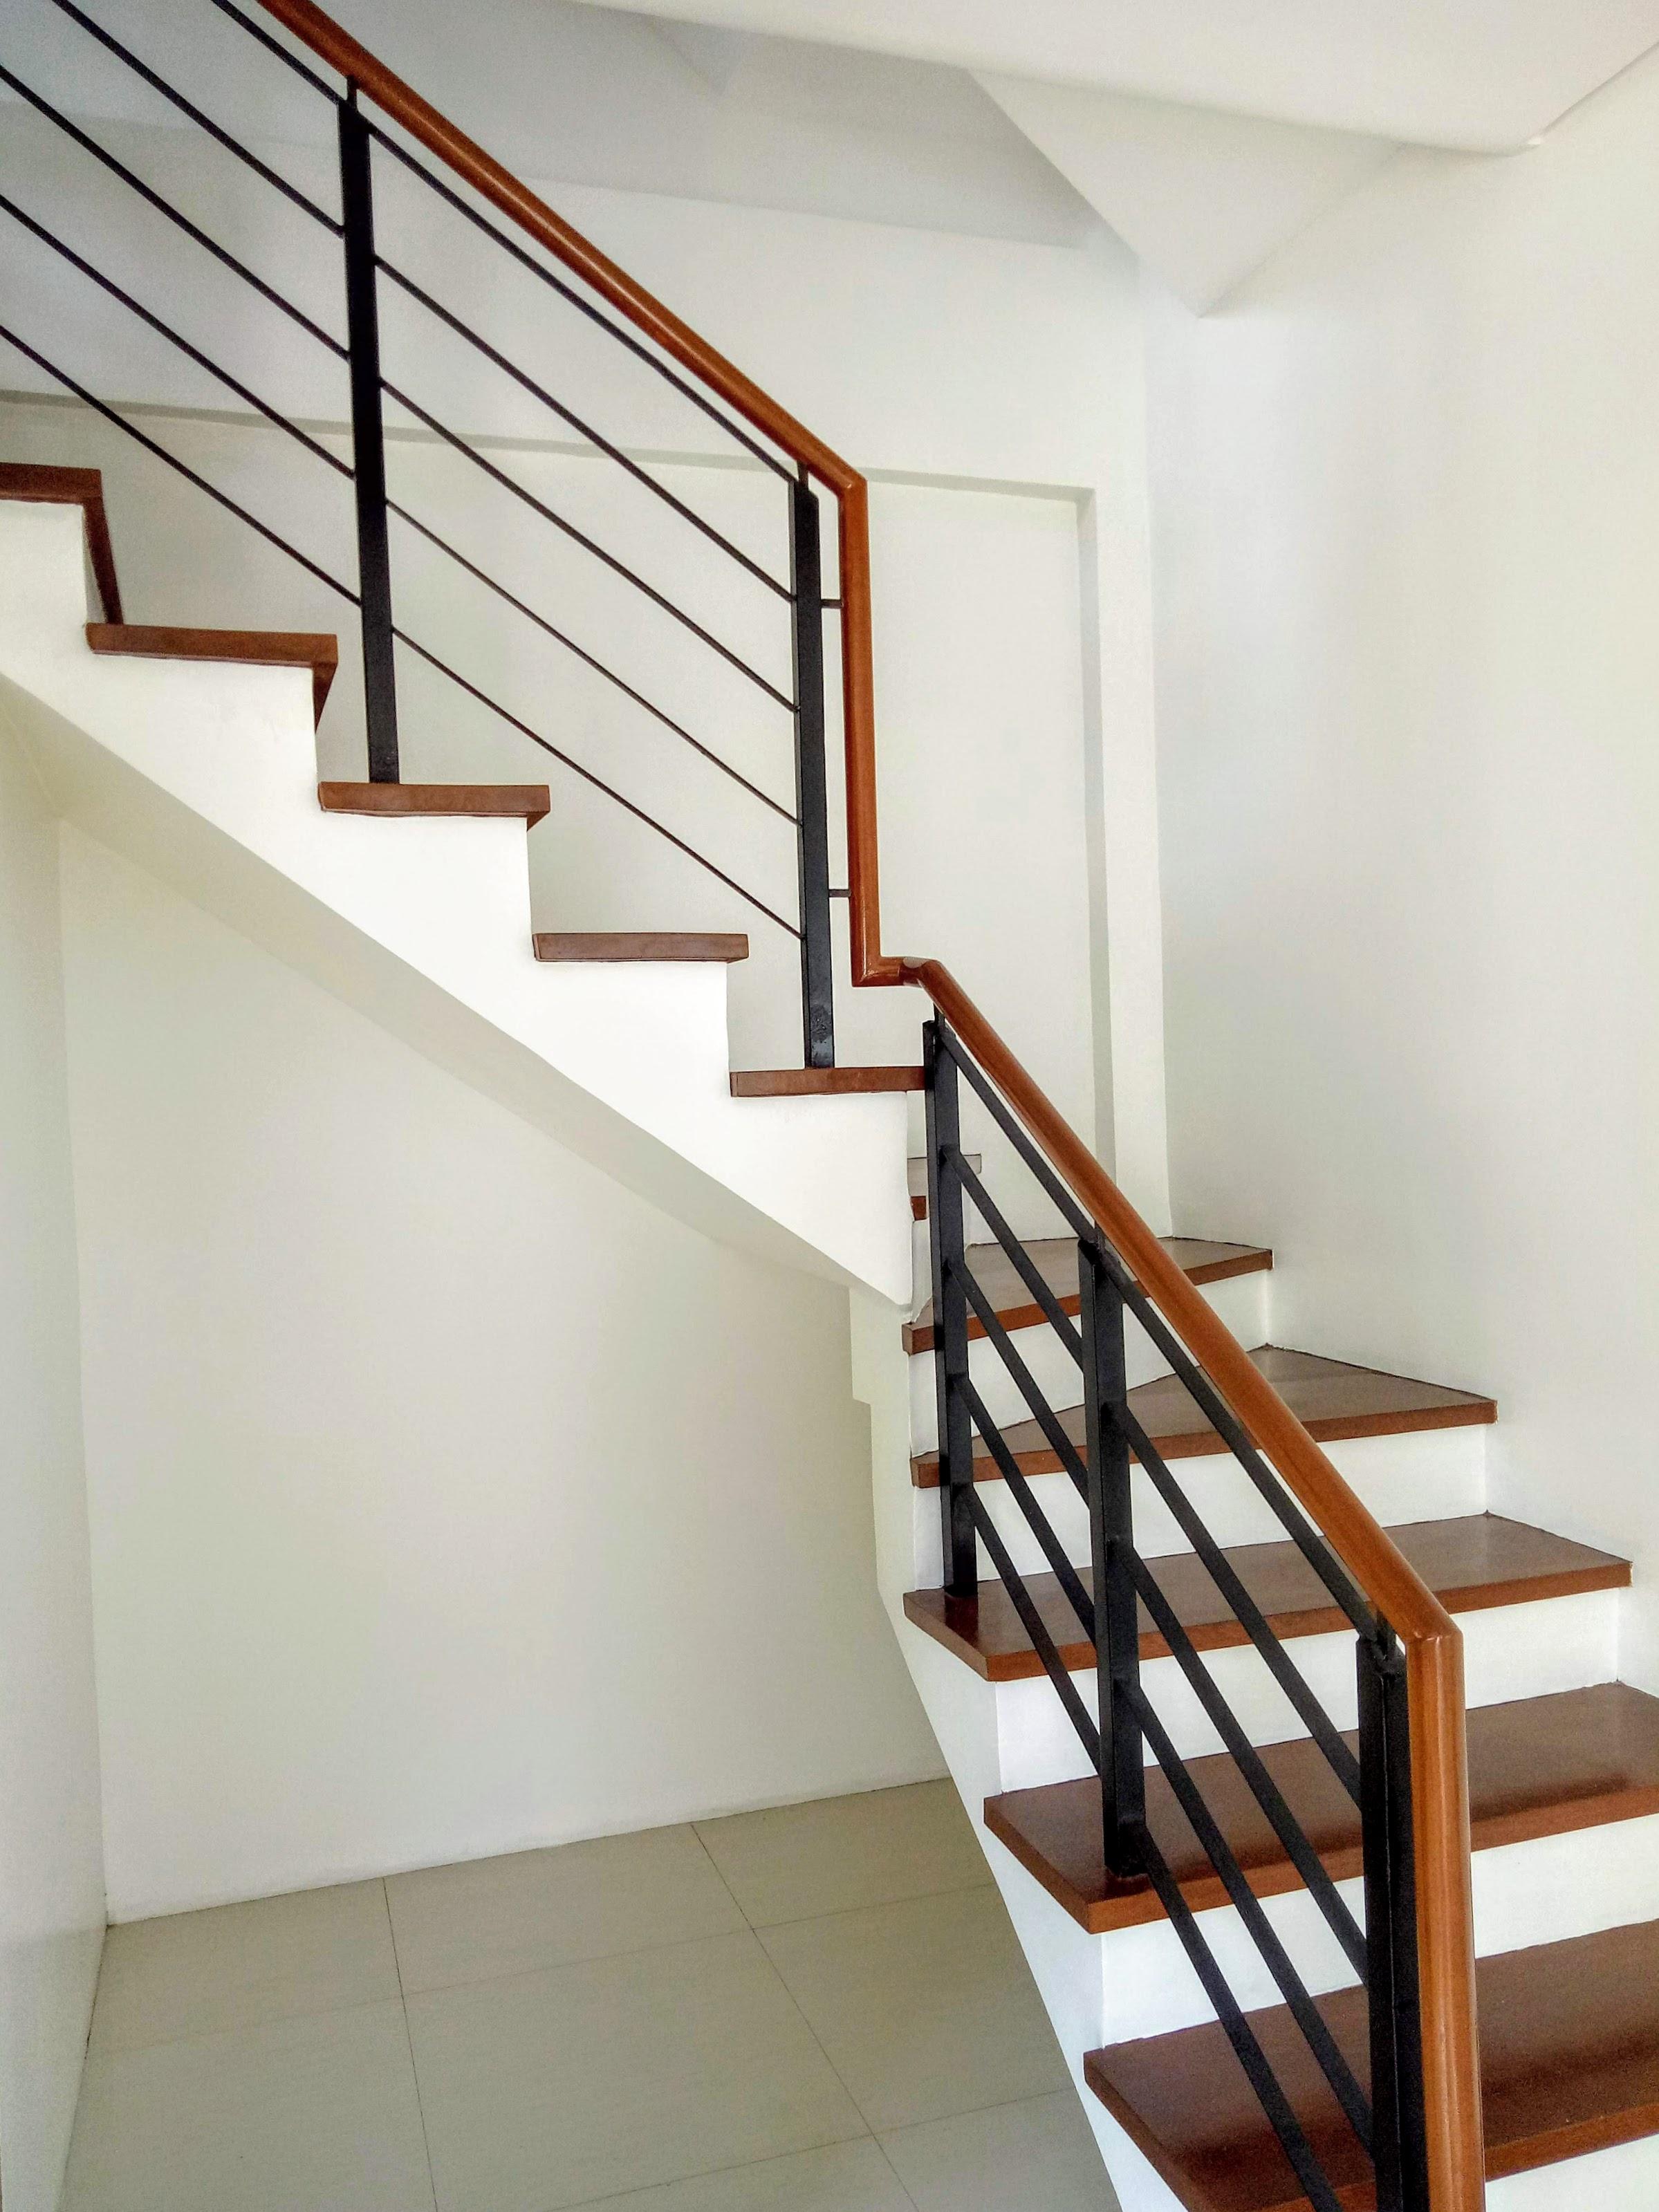 33 Harmony staircase